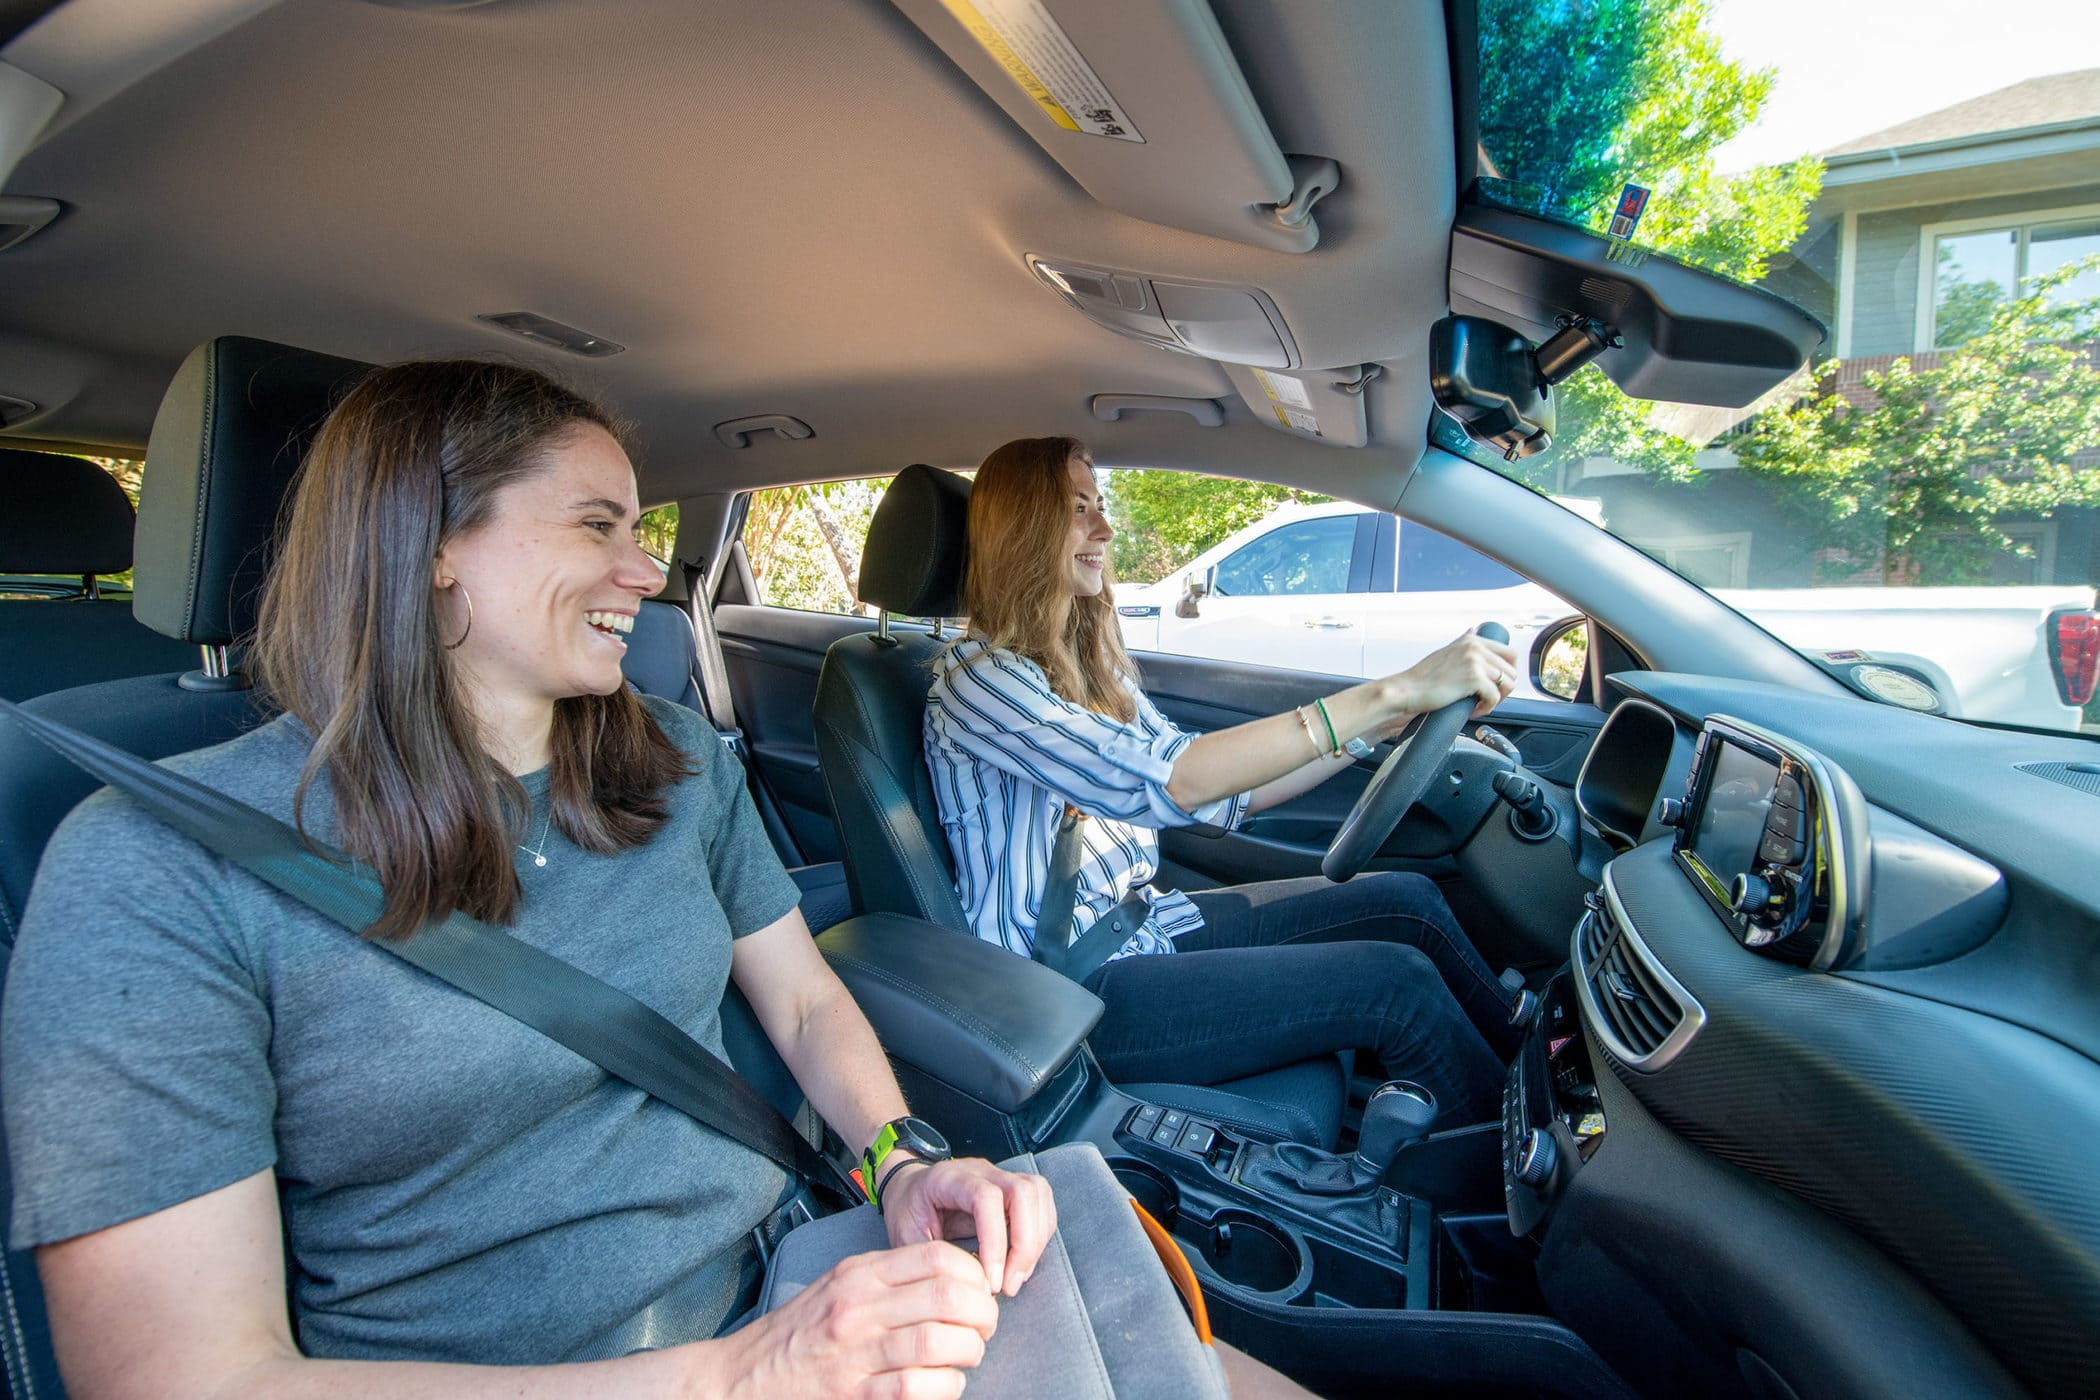 Two girls carpool to work together